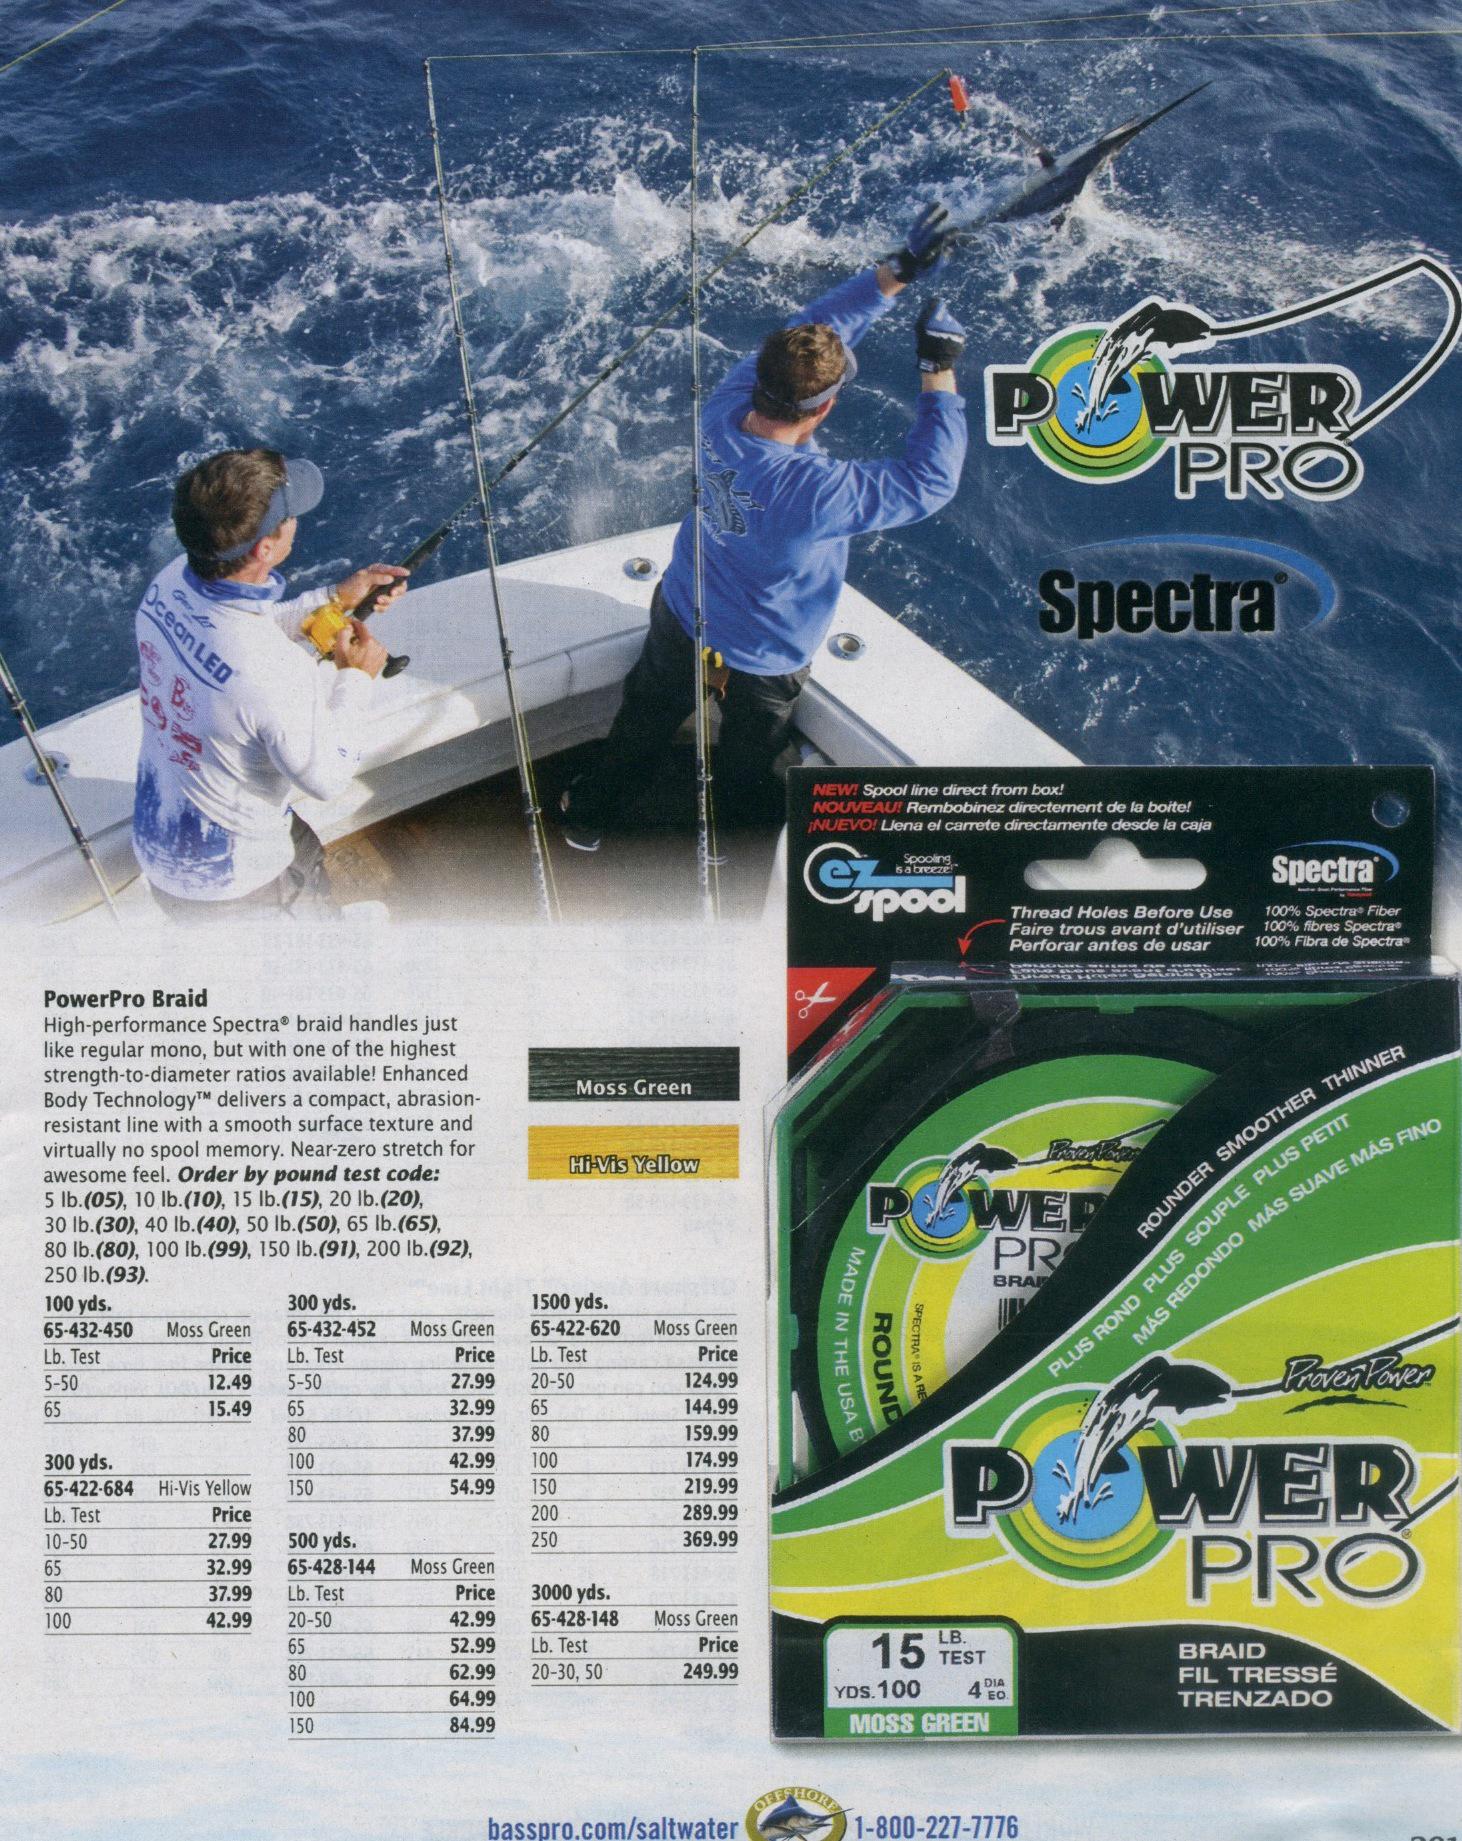 peter bass pro catalog 2010 1_2LG